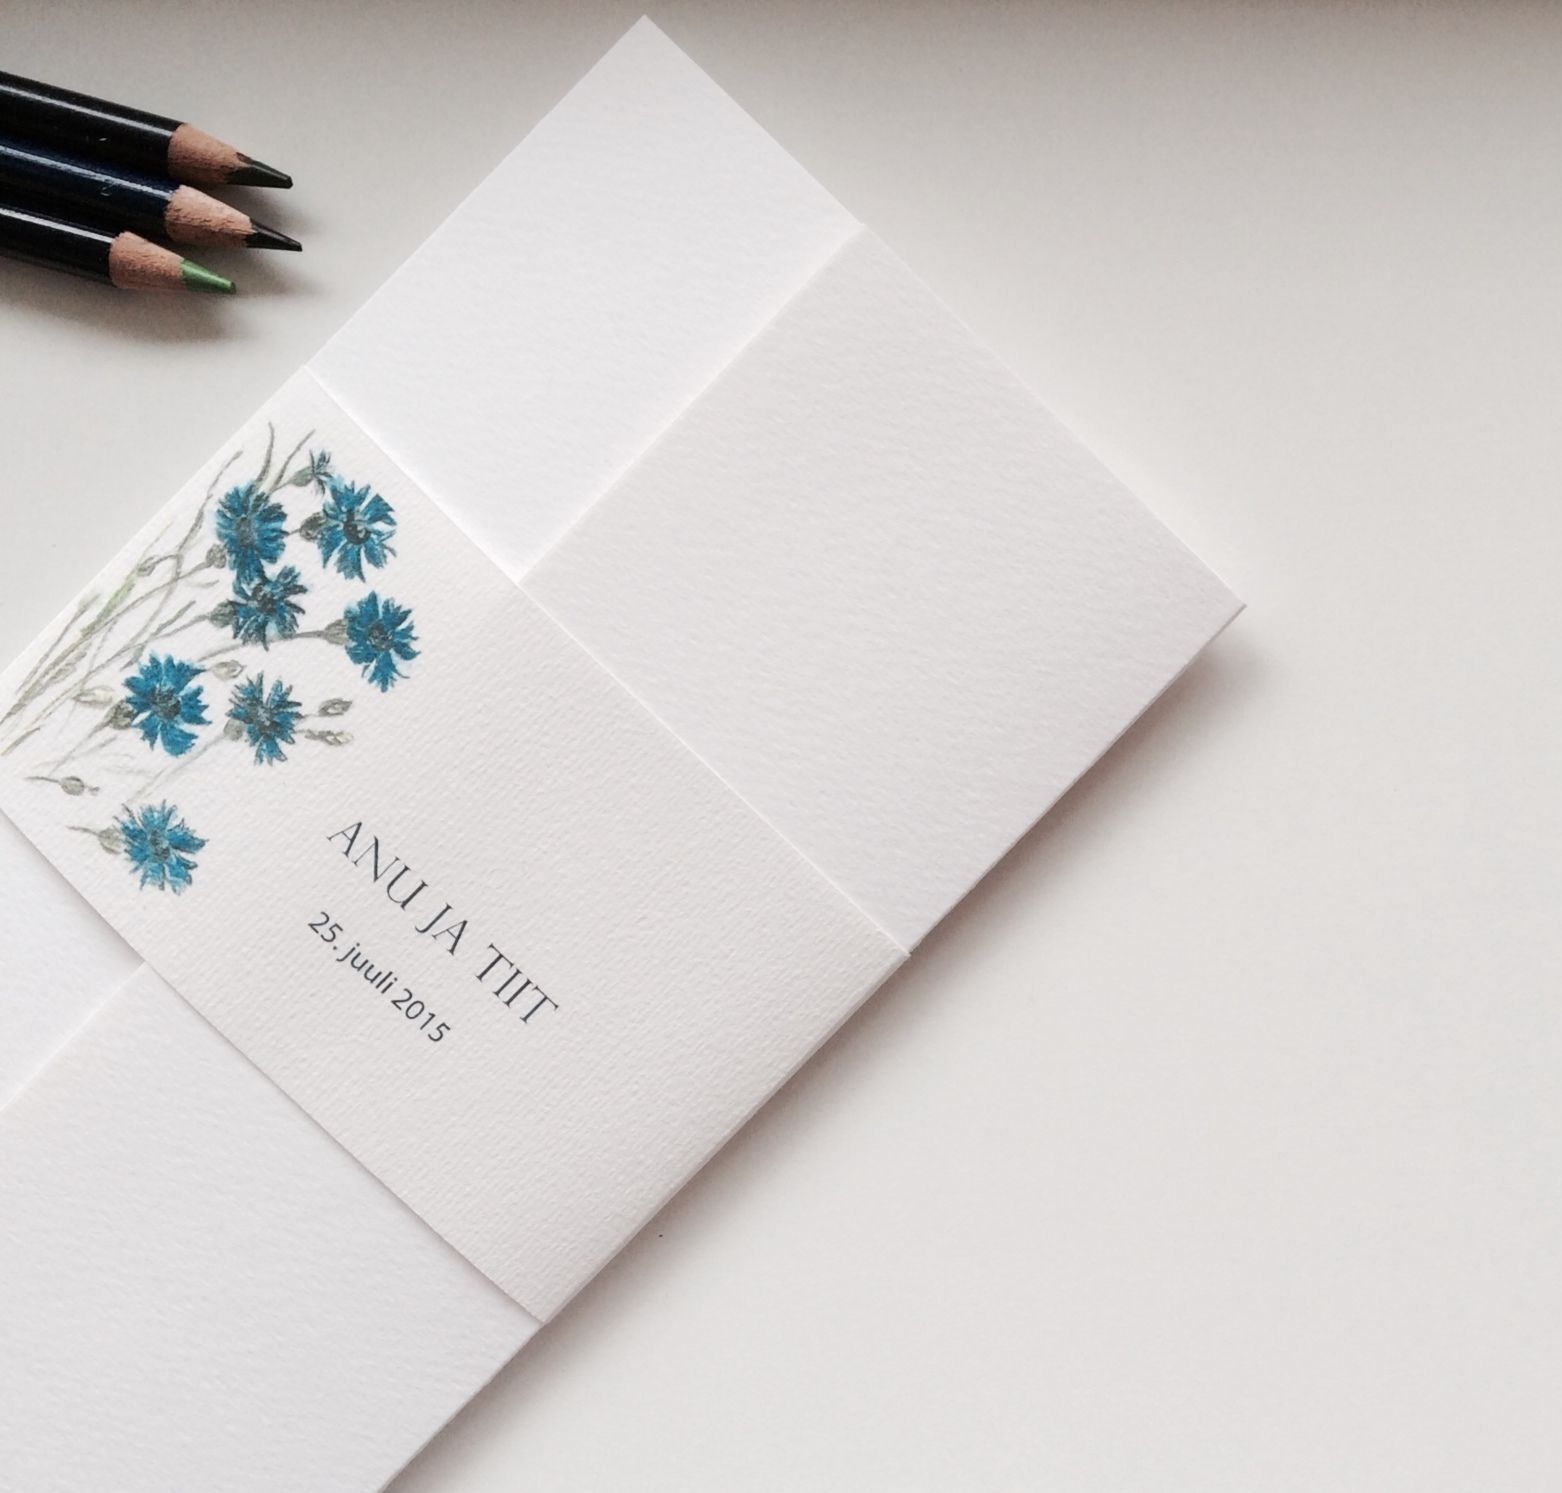 Cornflower blue, wedding invitation | Rustic wedding | Pinterest ...